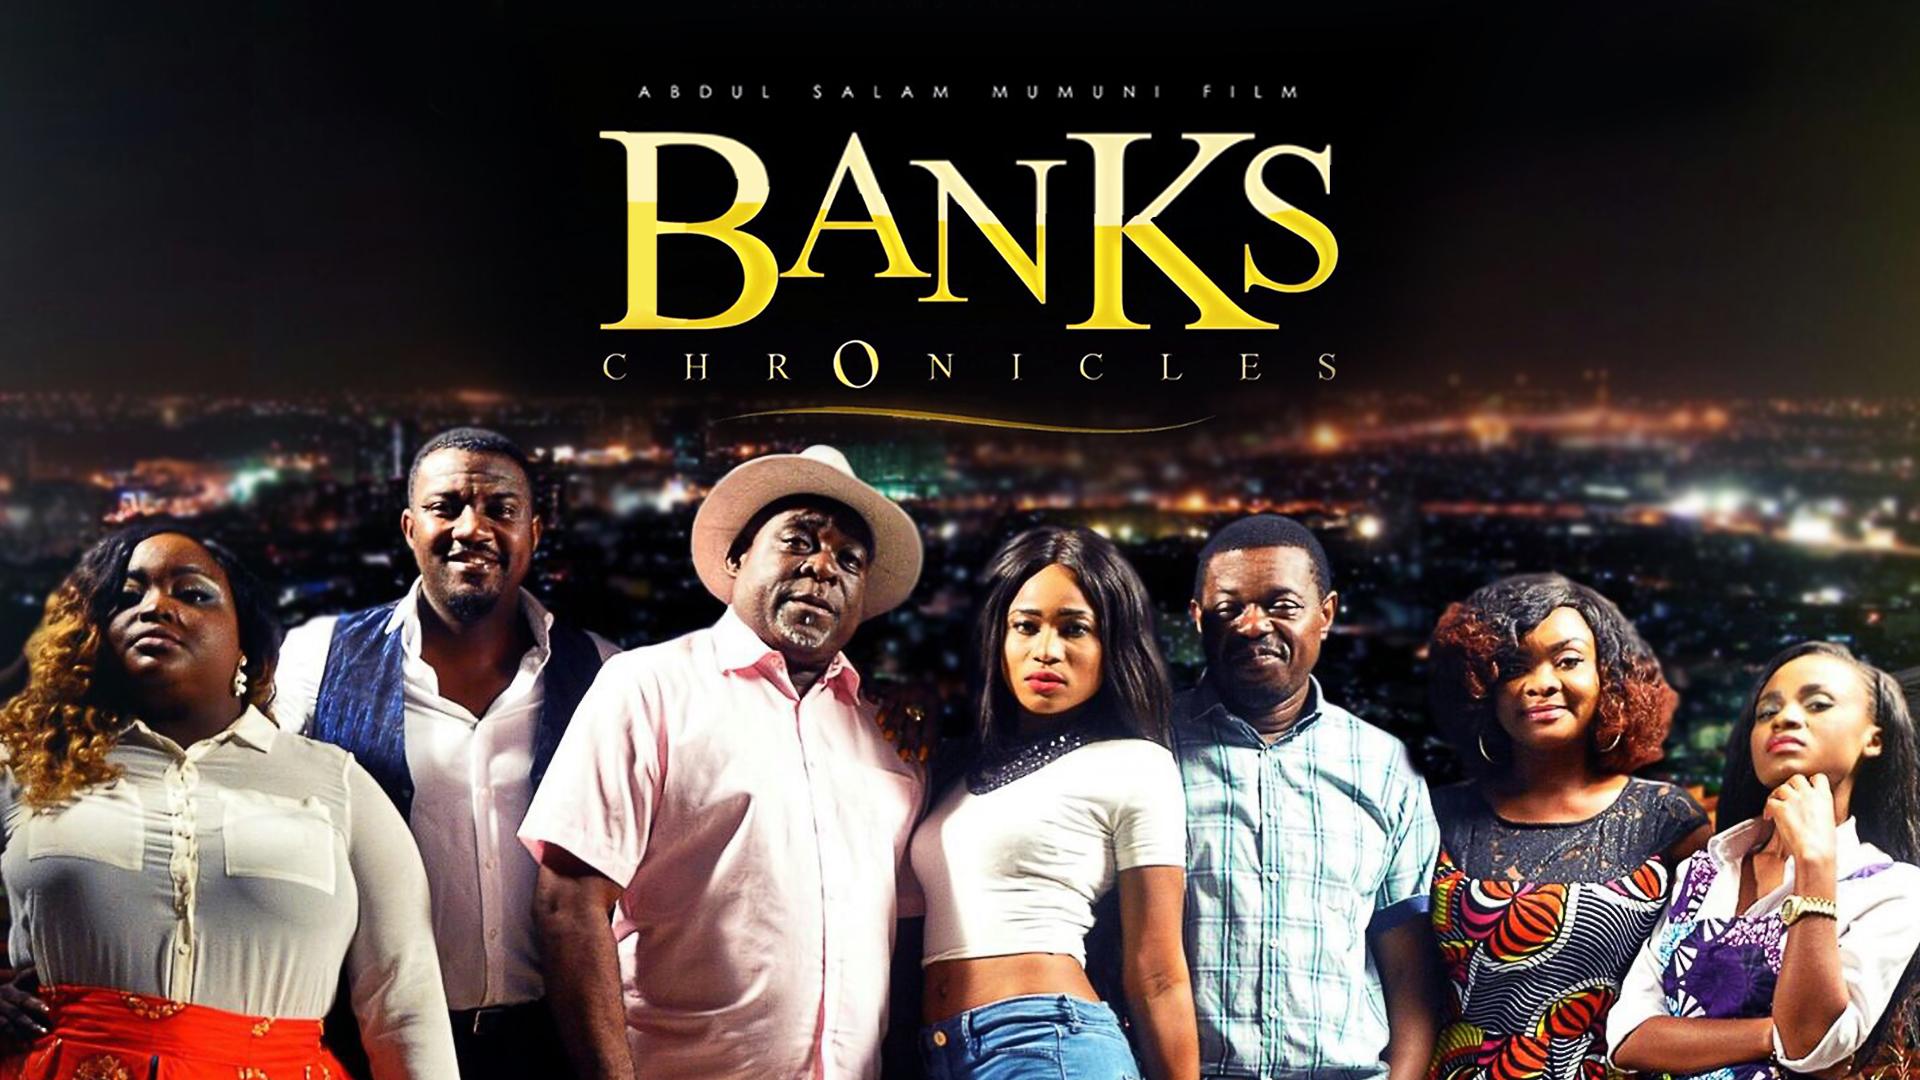 Bank Chronicles